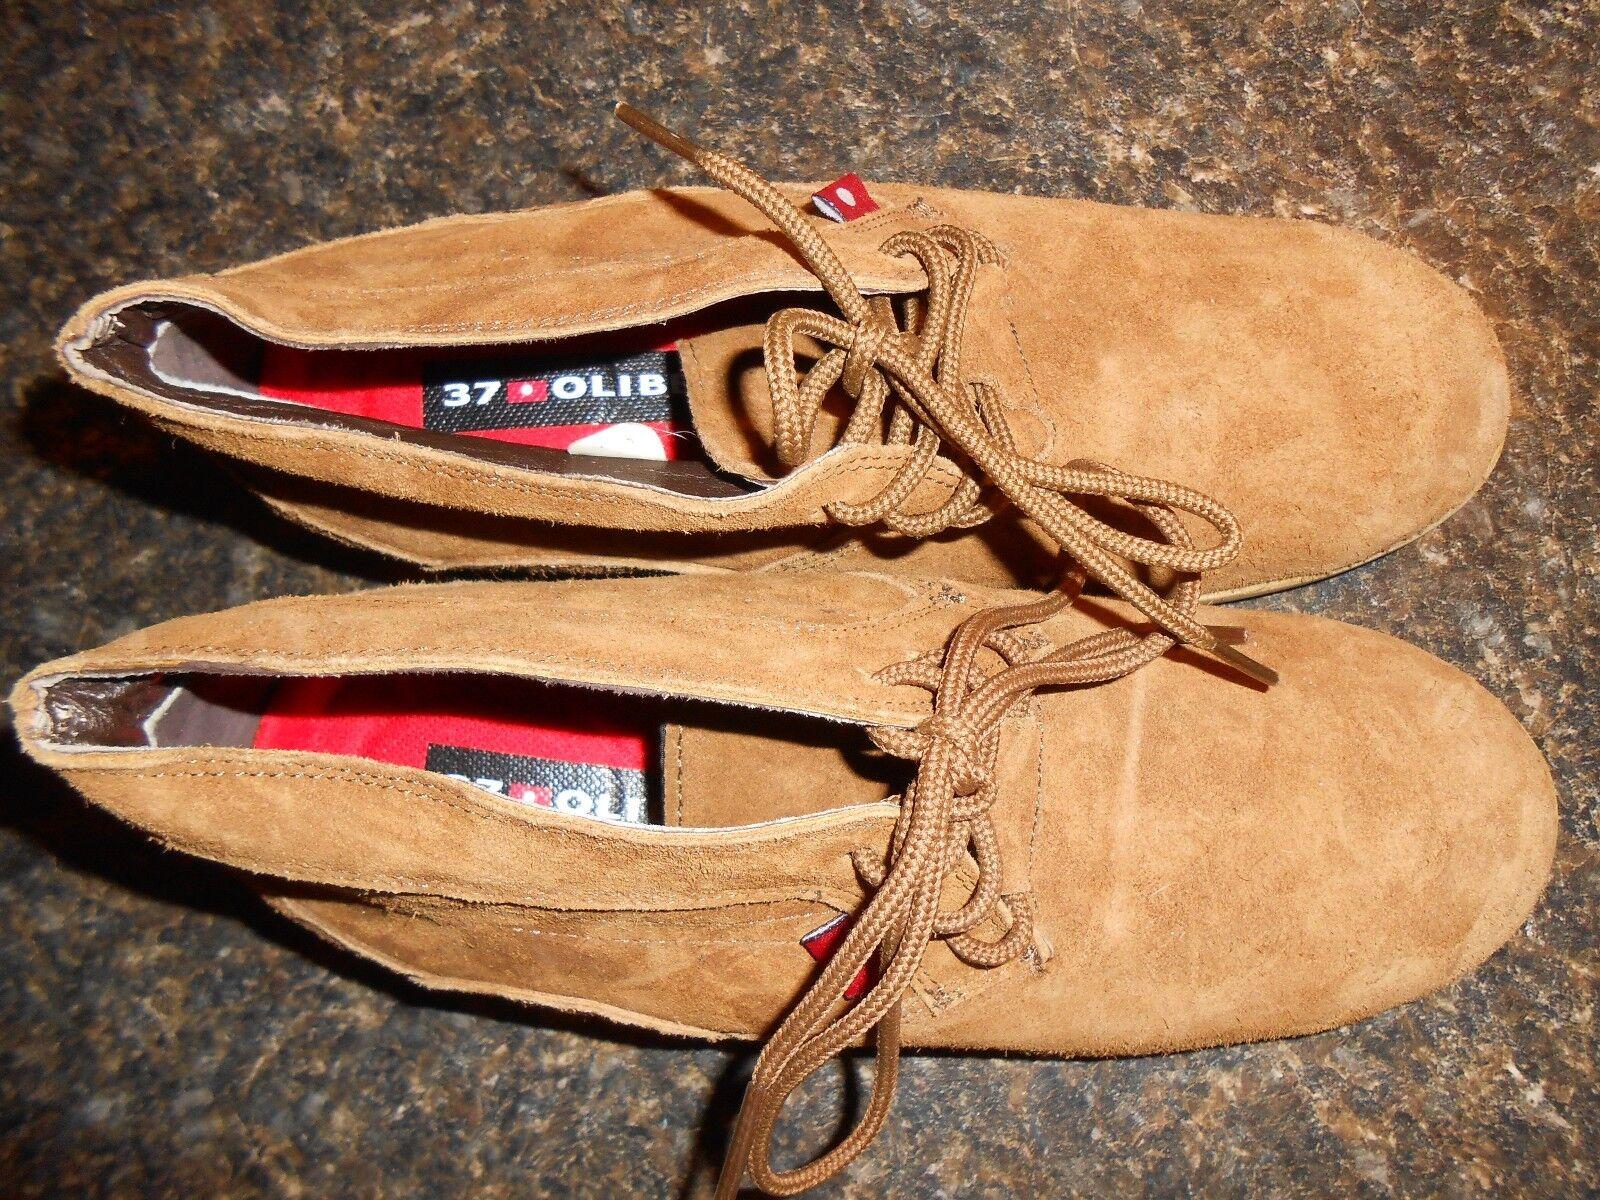 Oliberte mocha suede Malawa leather oxford scarpe wedges display sz 7M New no box